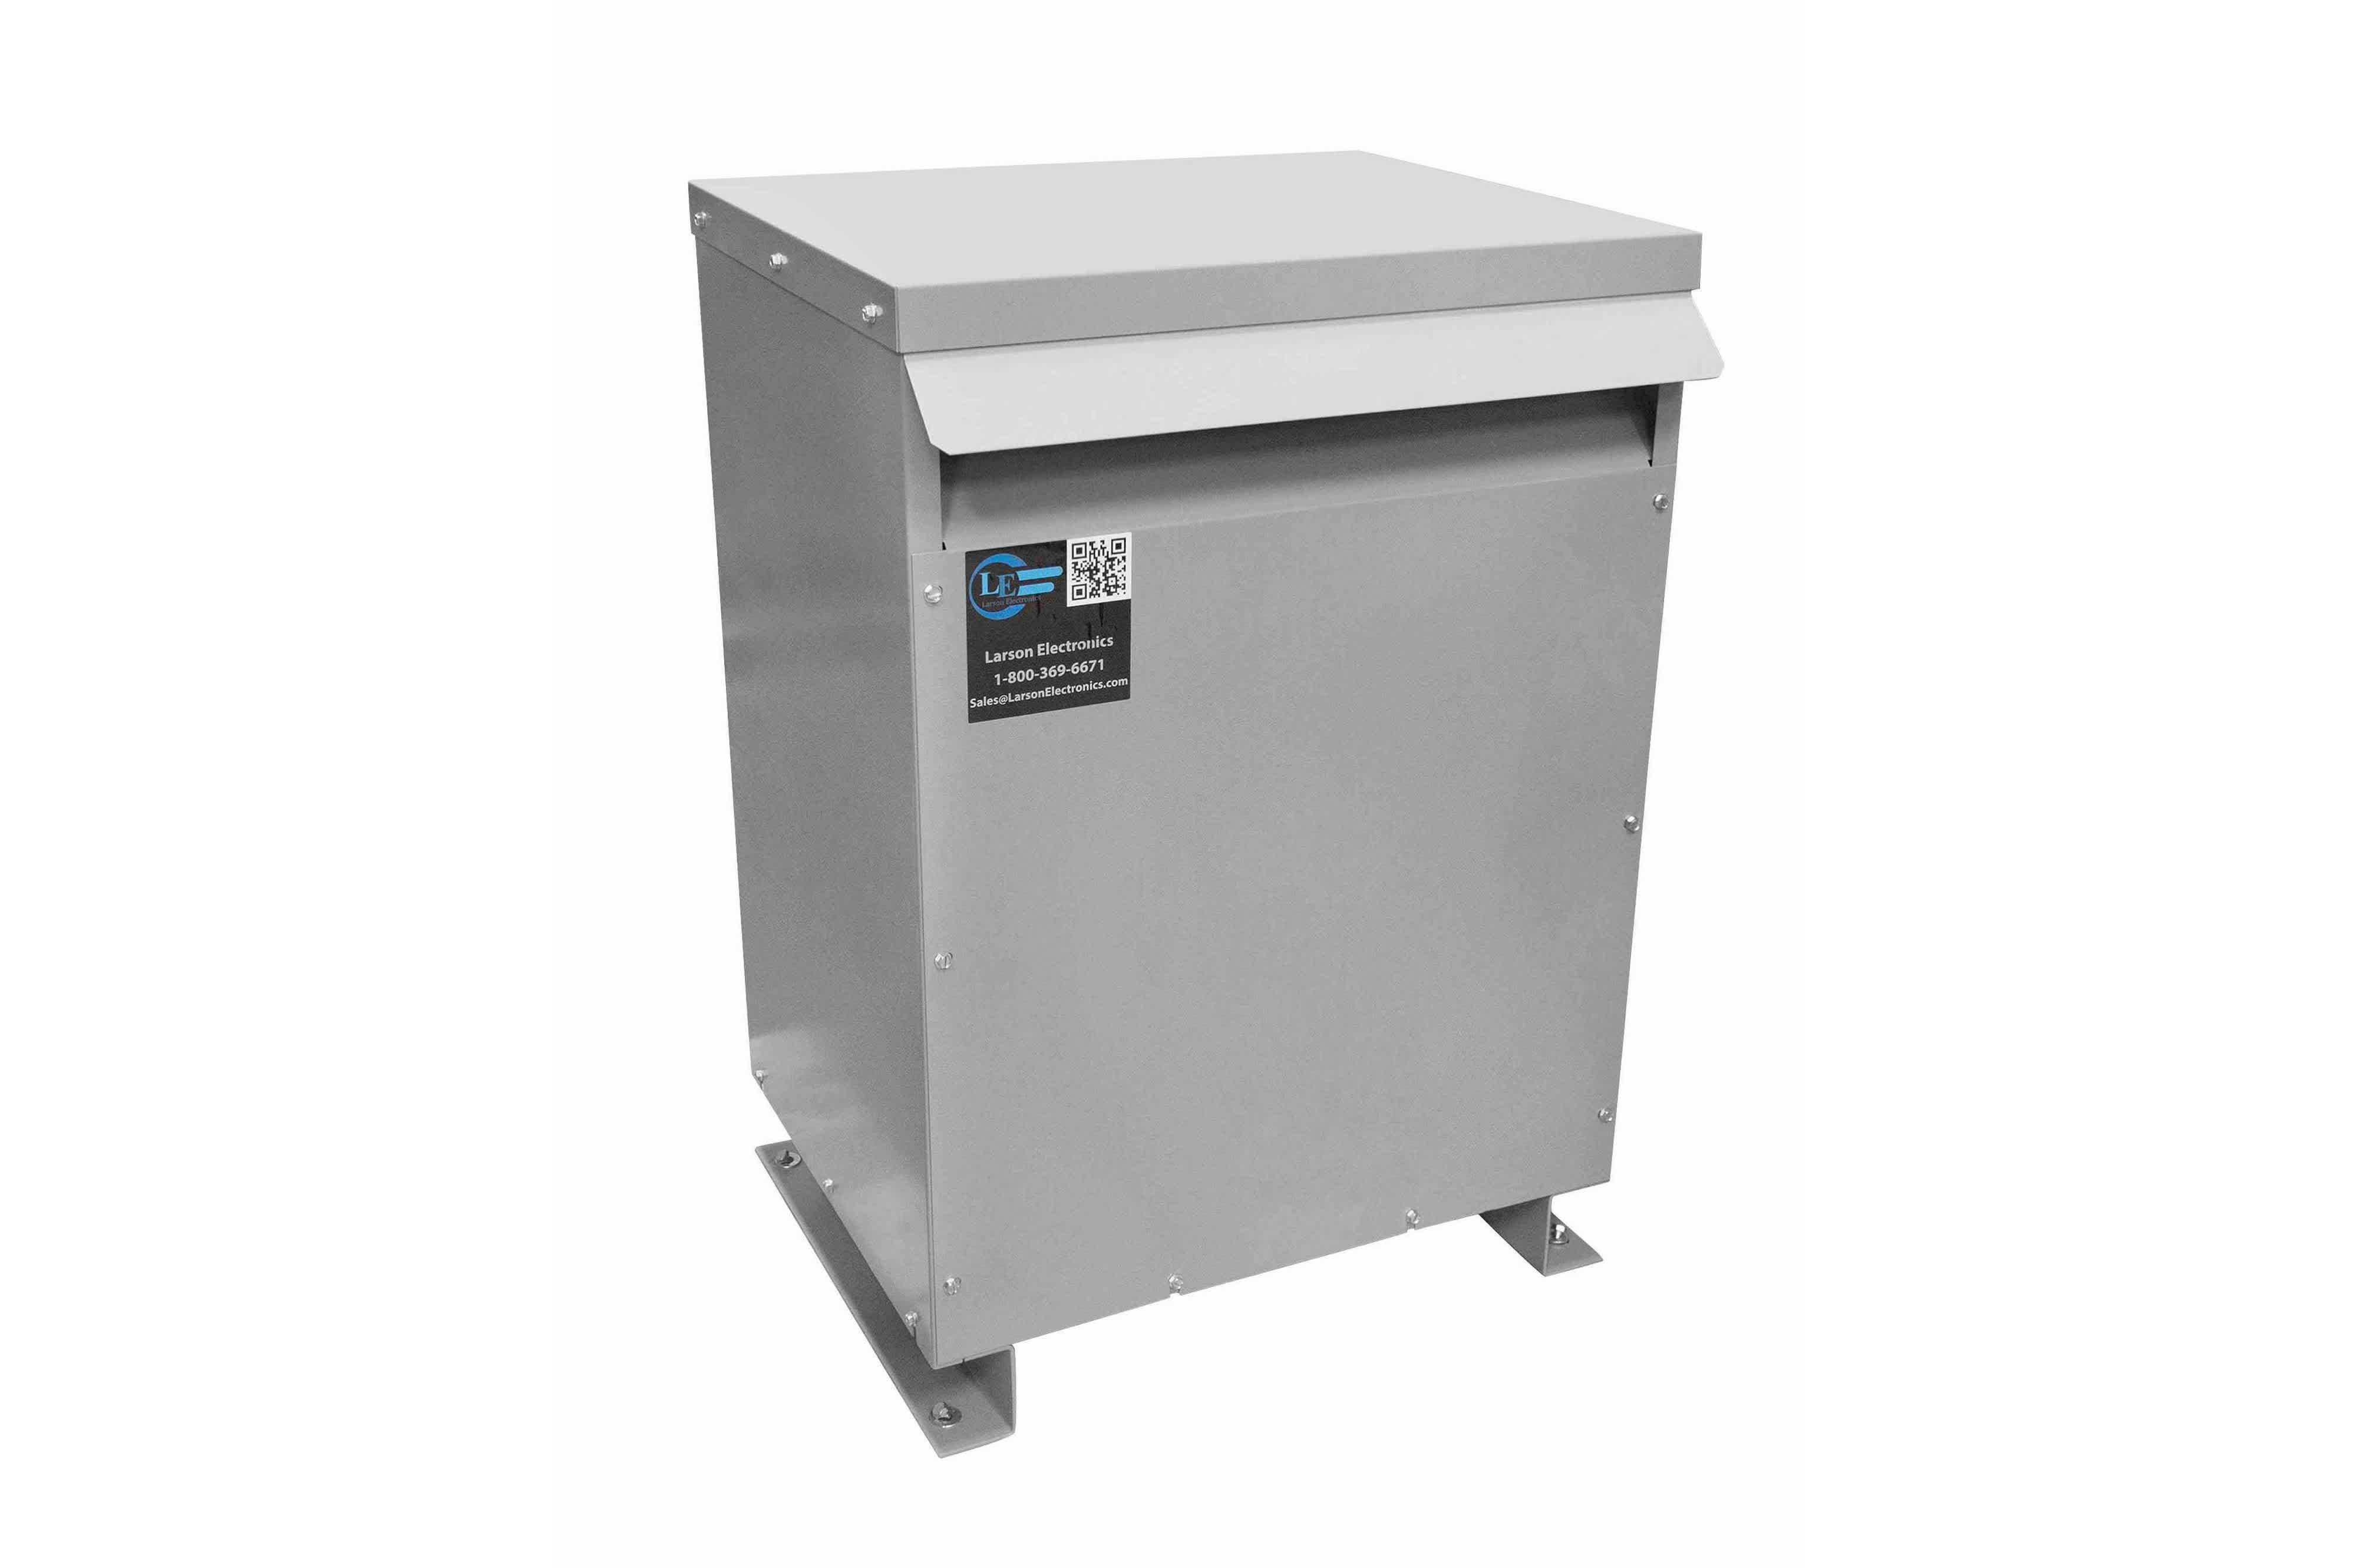 175 kVA 3PH Isolation Transformer, 208V Wye Primary, 400Y/231 Wye-N Secondary, N3R, Ventilated, 60 Hz